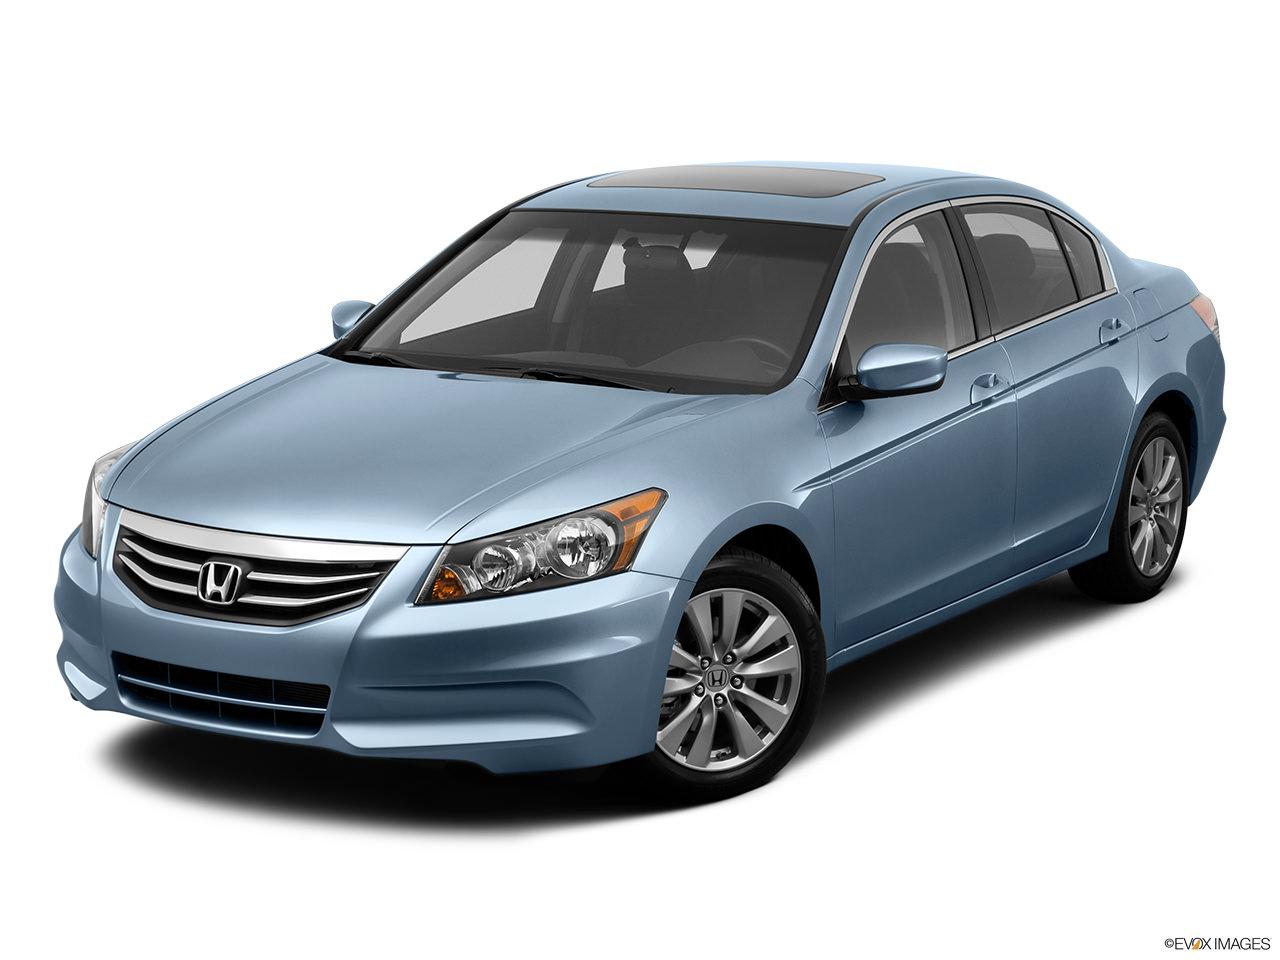 2012 honda accord vs 2012 honda civic which one should i for Honda accord vs civic